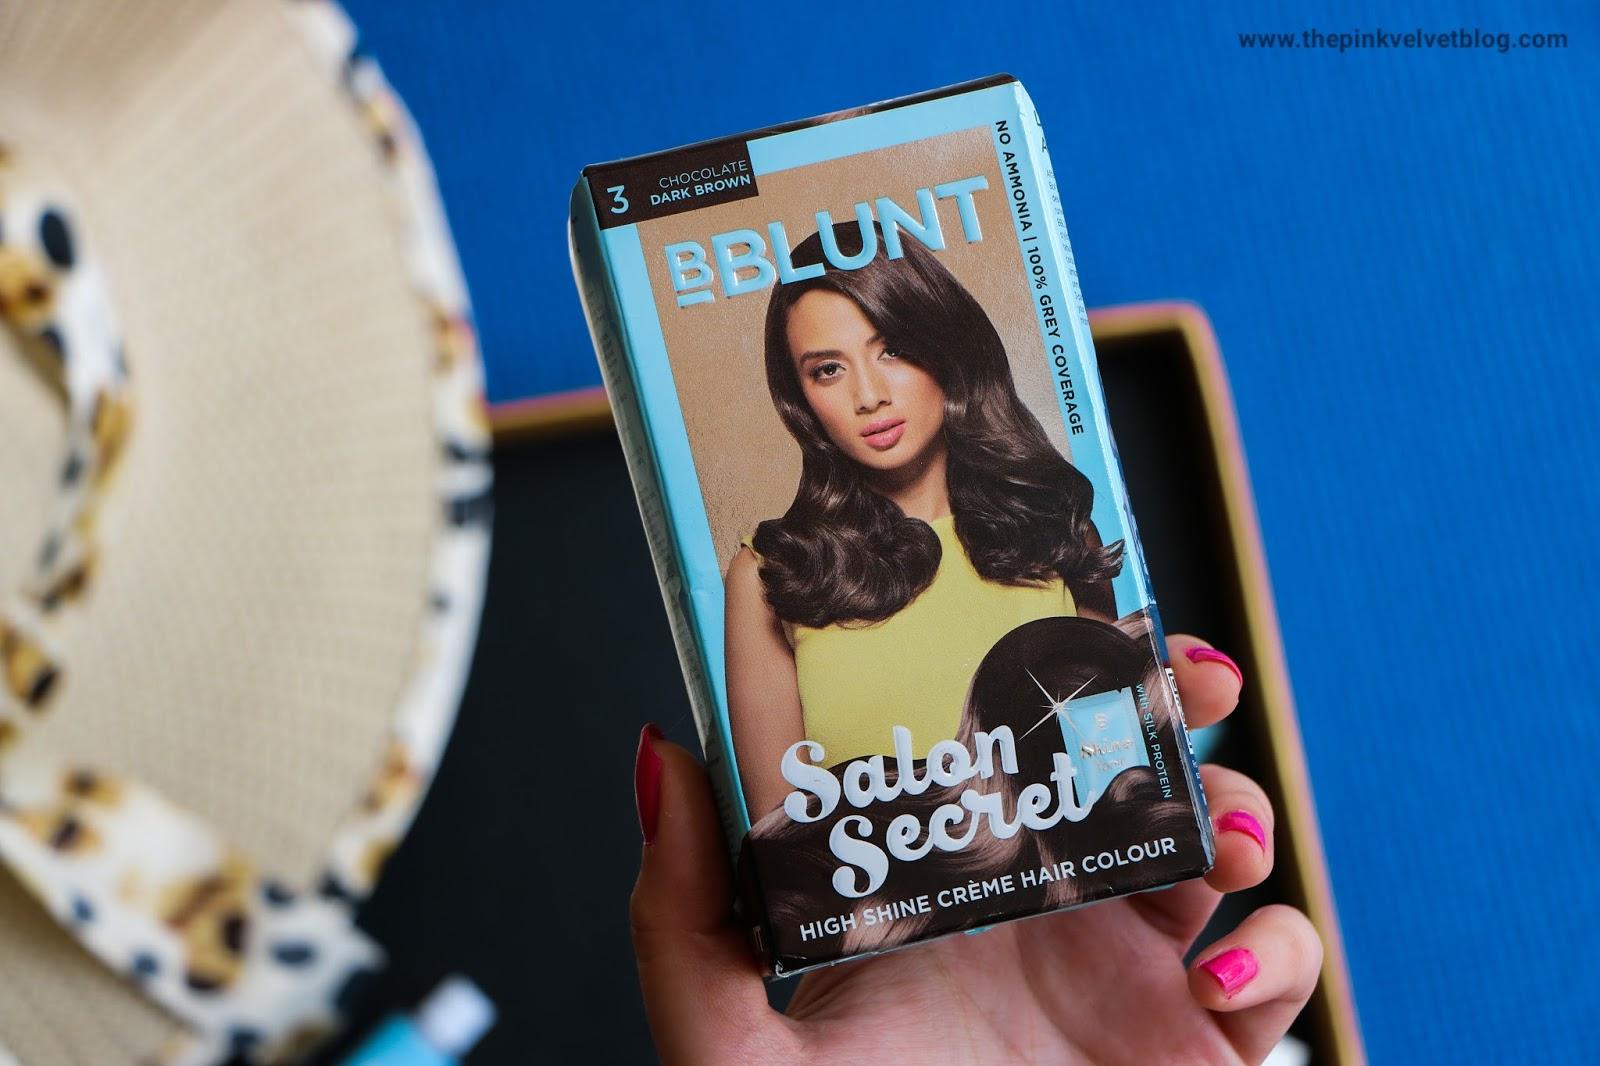 c6108c69547 My Experience With BBLUNT Salon Secret High Shine Creme Hair Color ...